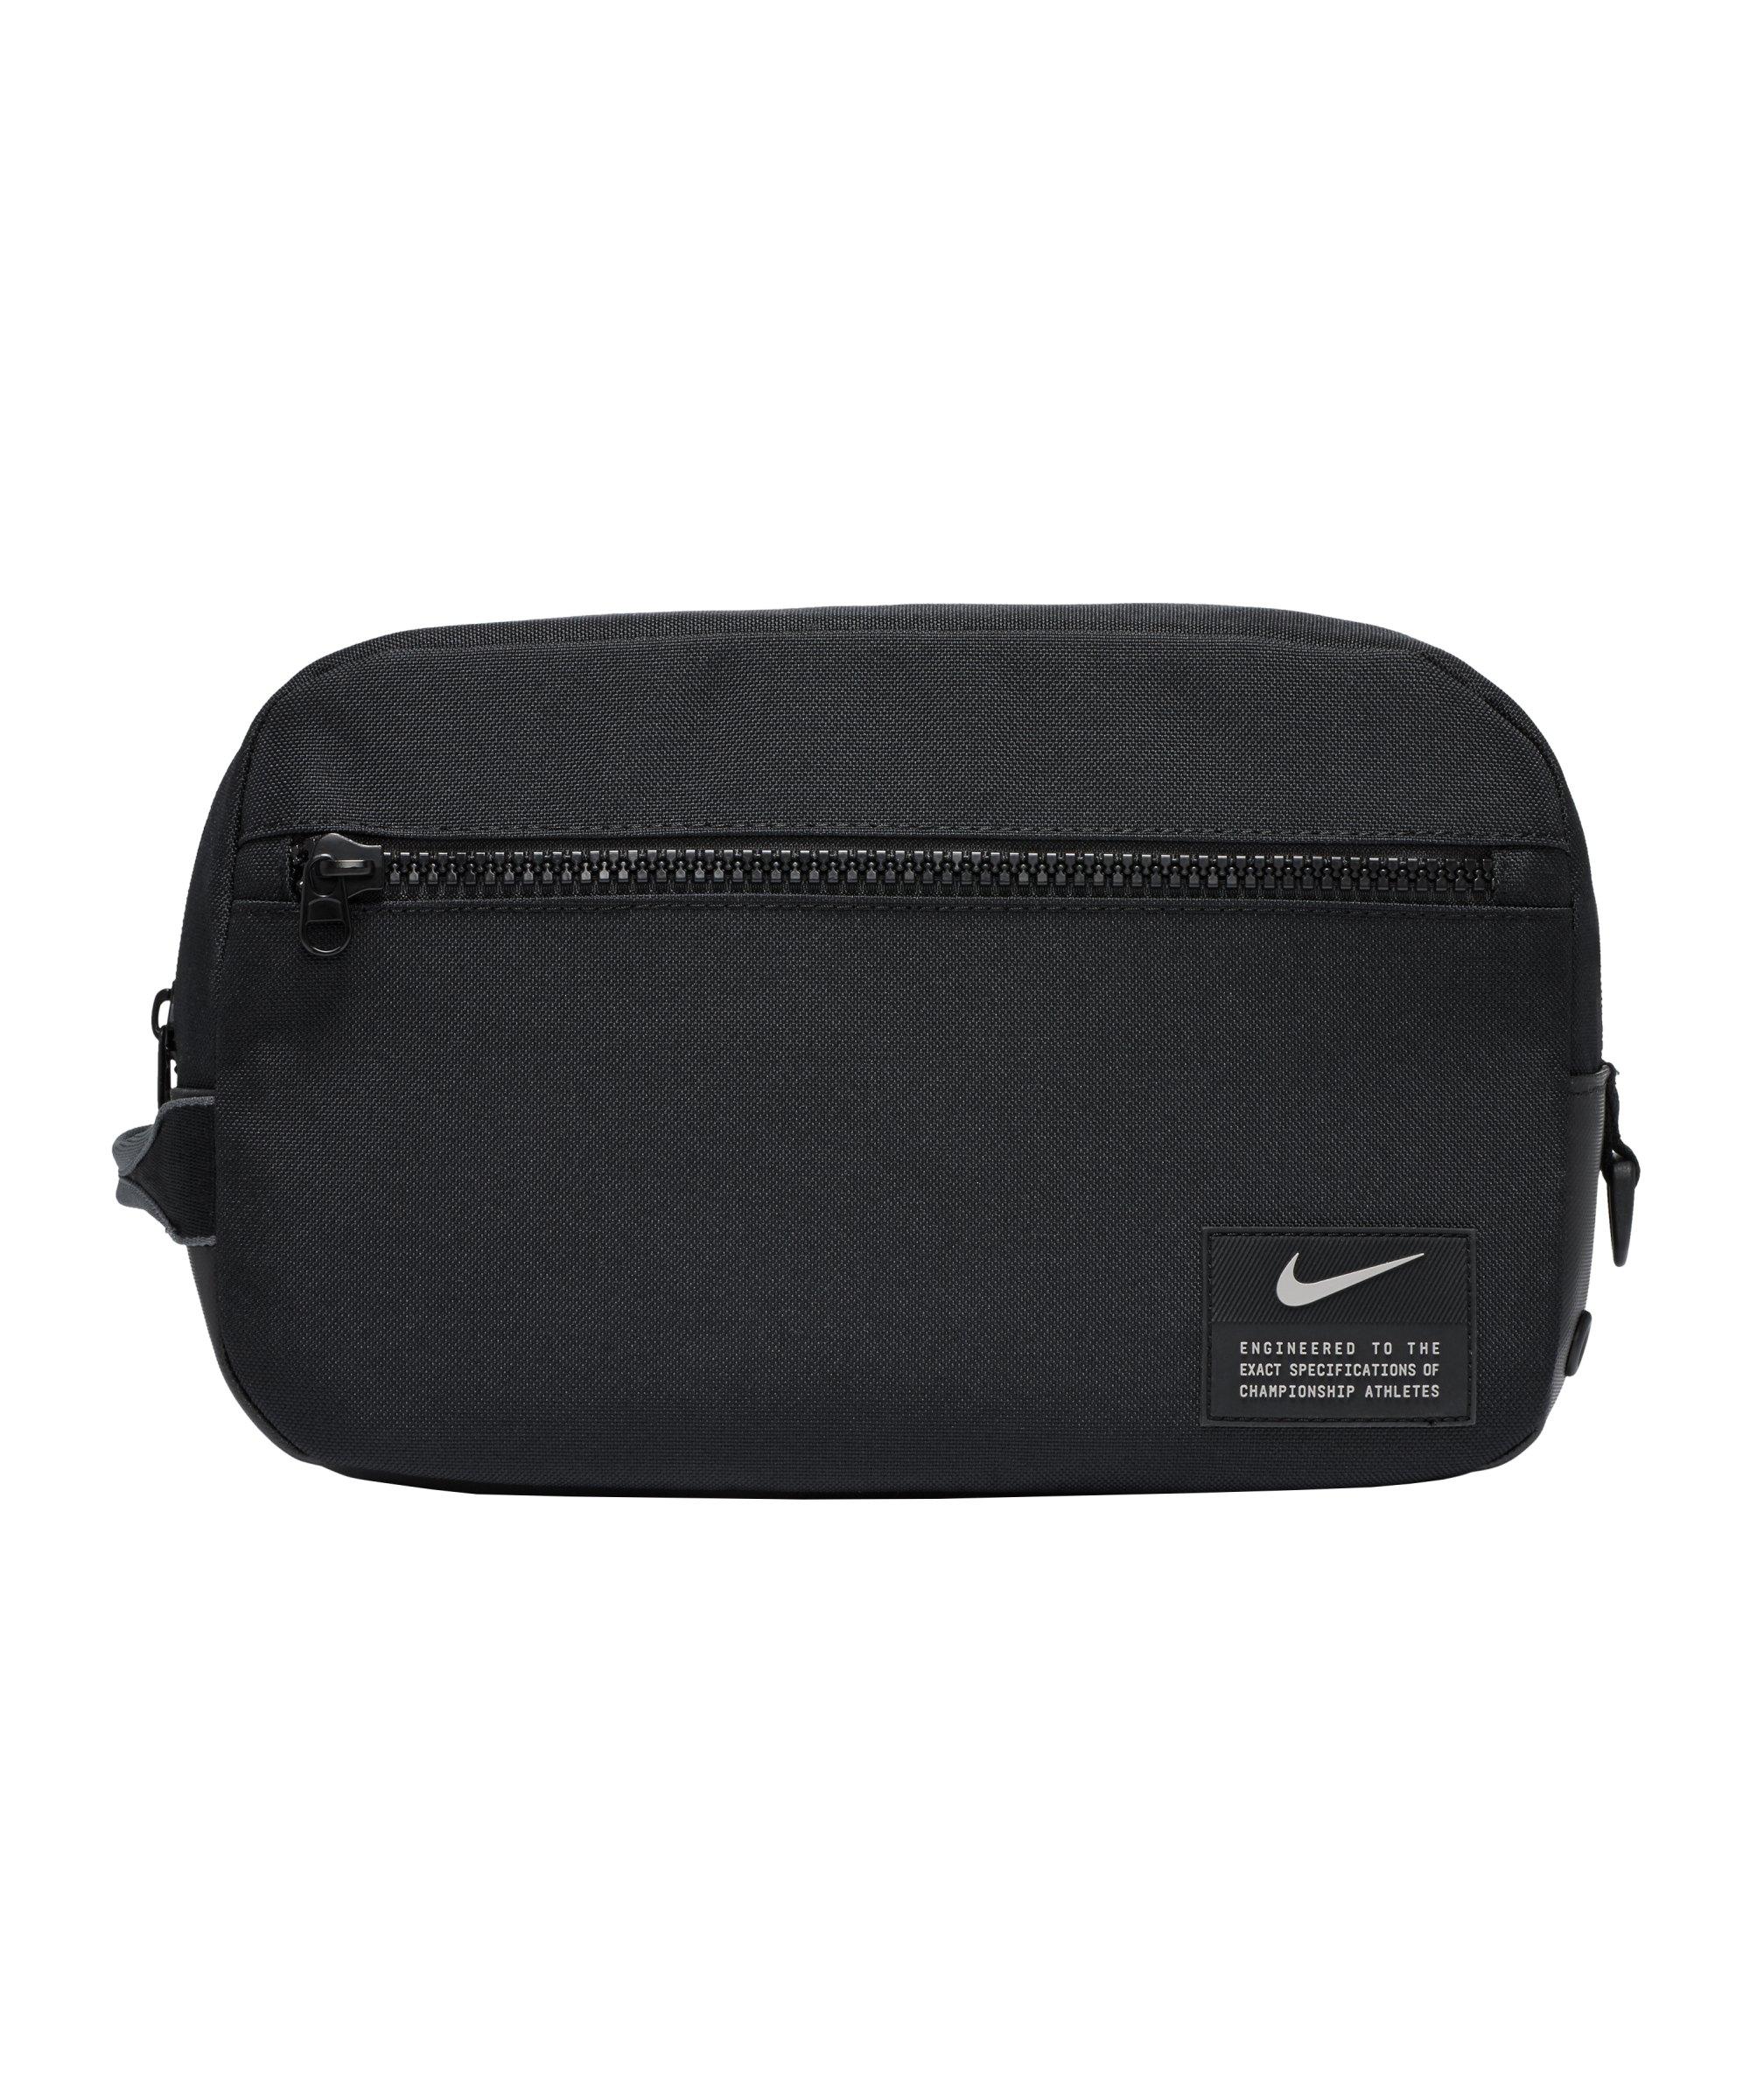 Nike Utility Modular Tasche Schwarz F010 - schwarz